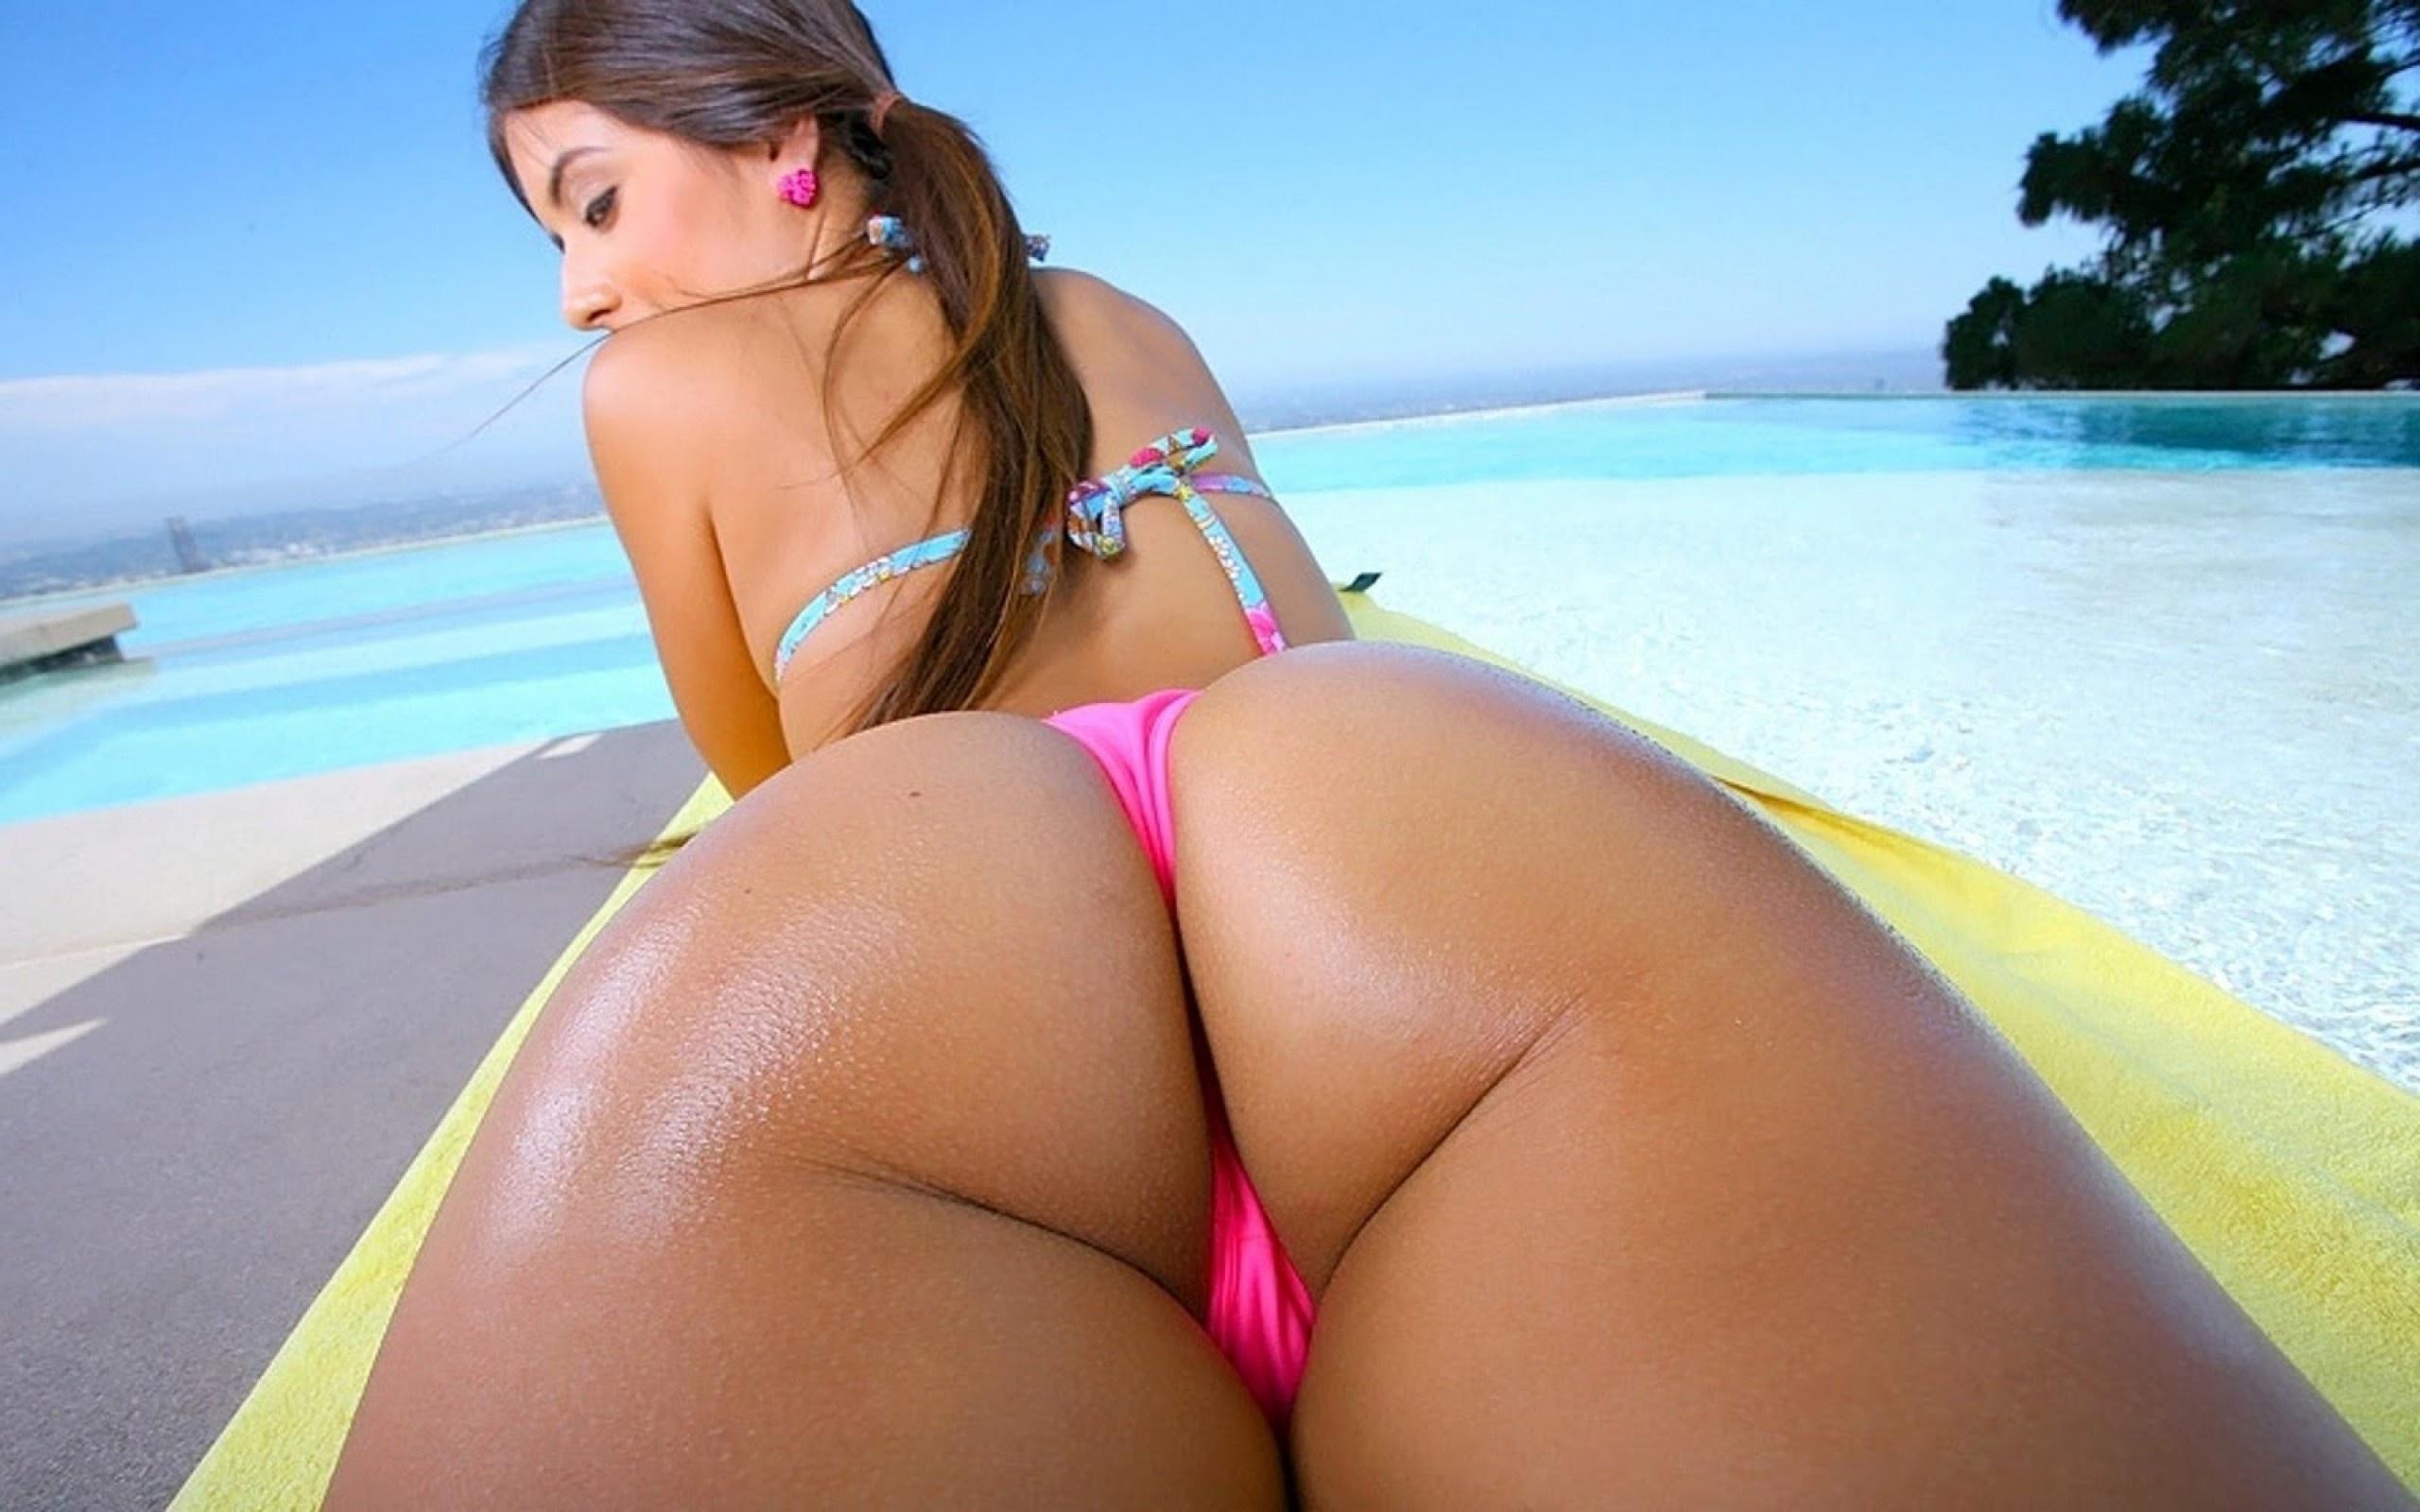 Секси попки в бикини порно 15 фотография